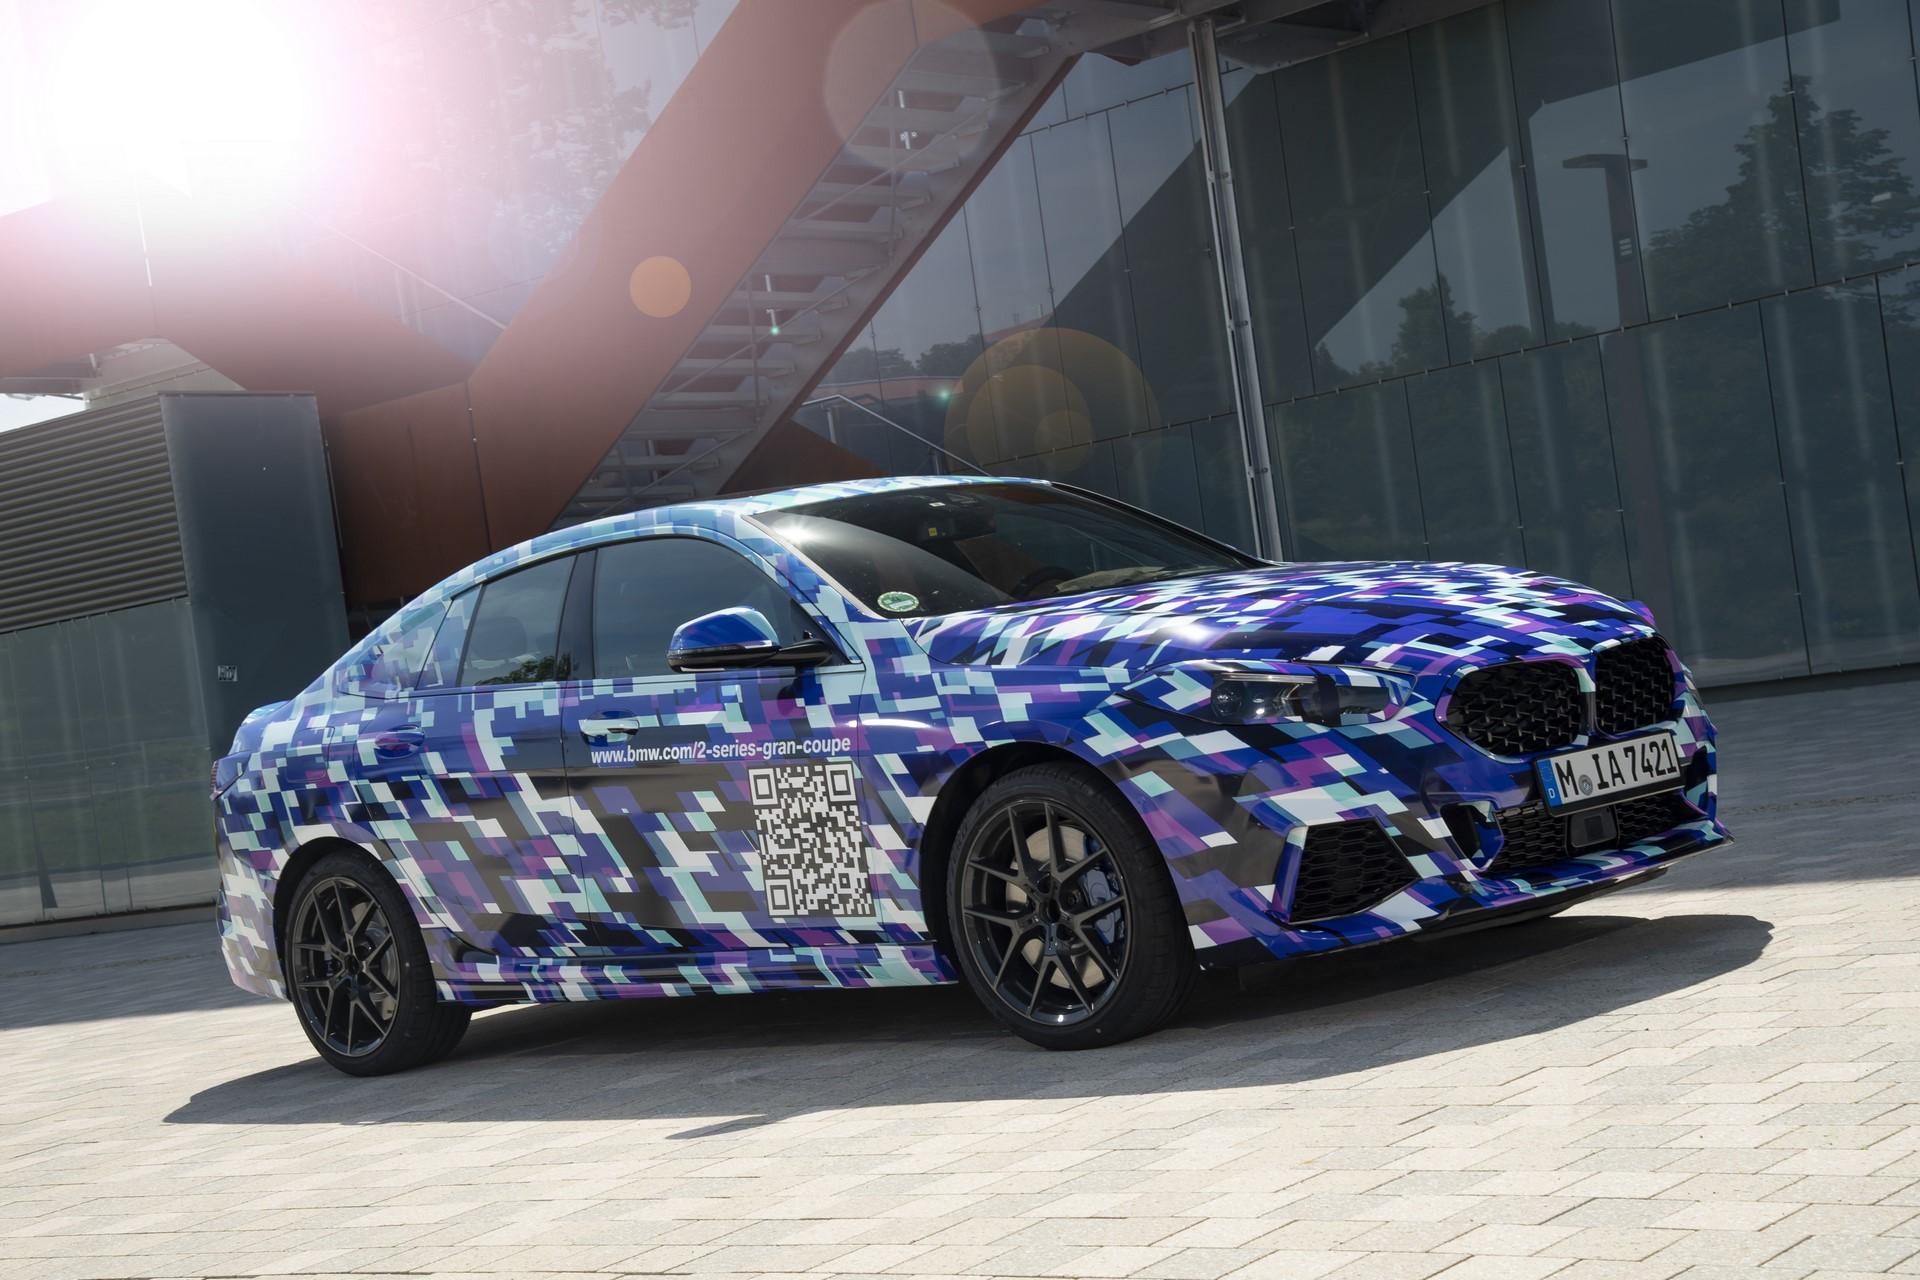 BMW-2-Series-Gran-Coupe-2020-spy-photos-19